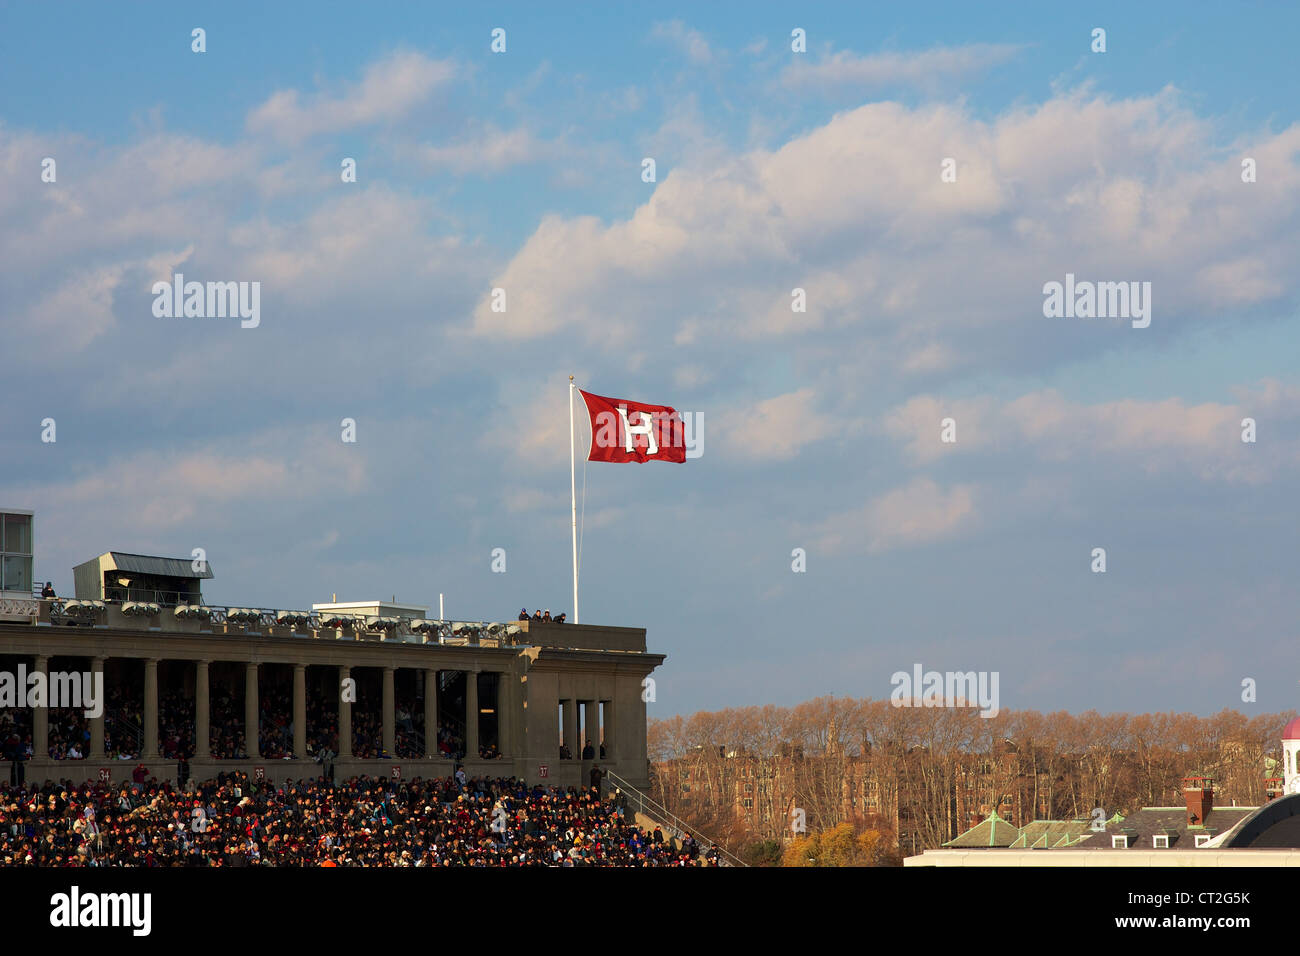 Harvard University's athletics 'H' flag streaming at the Harvard - Yale football game on November 20, - Stock Image